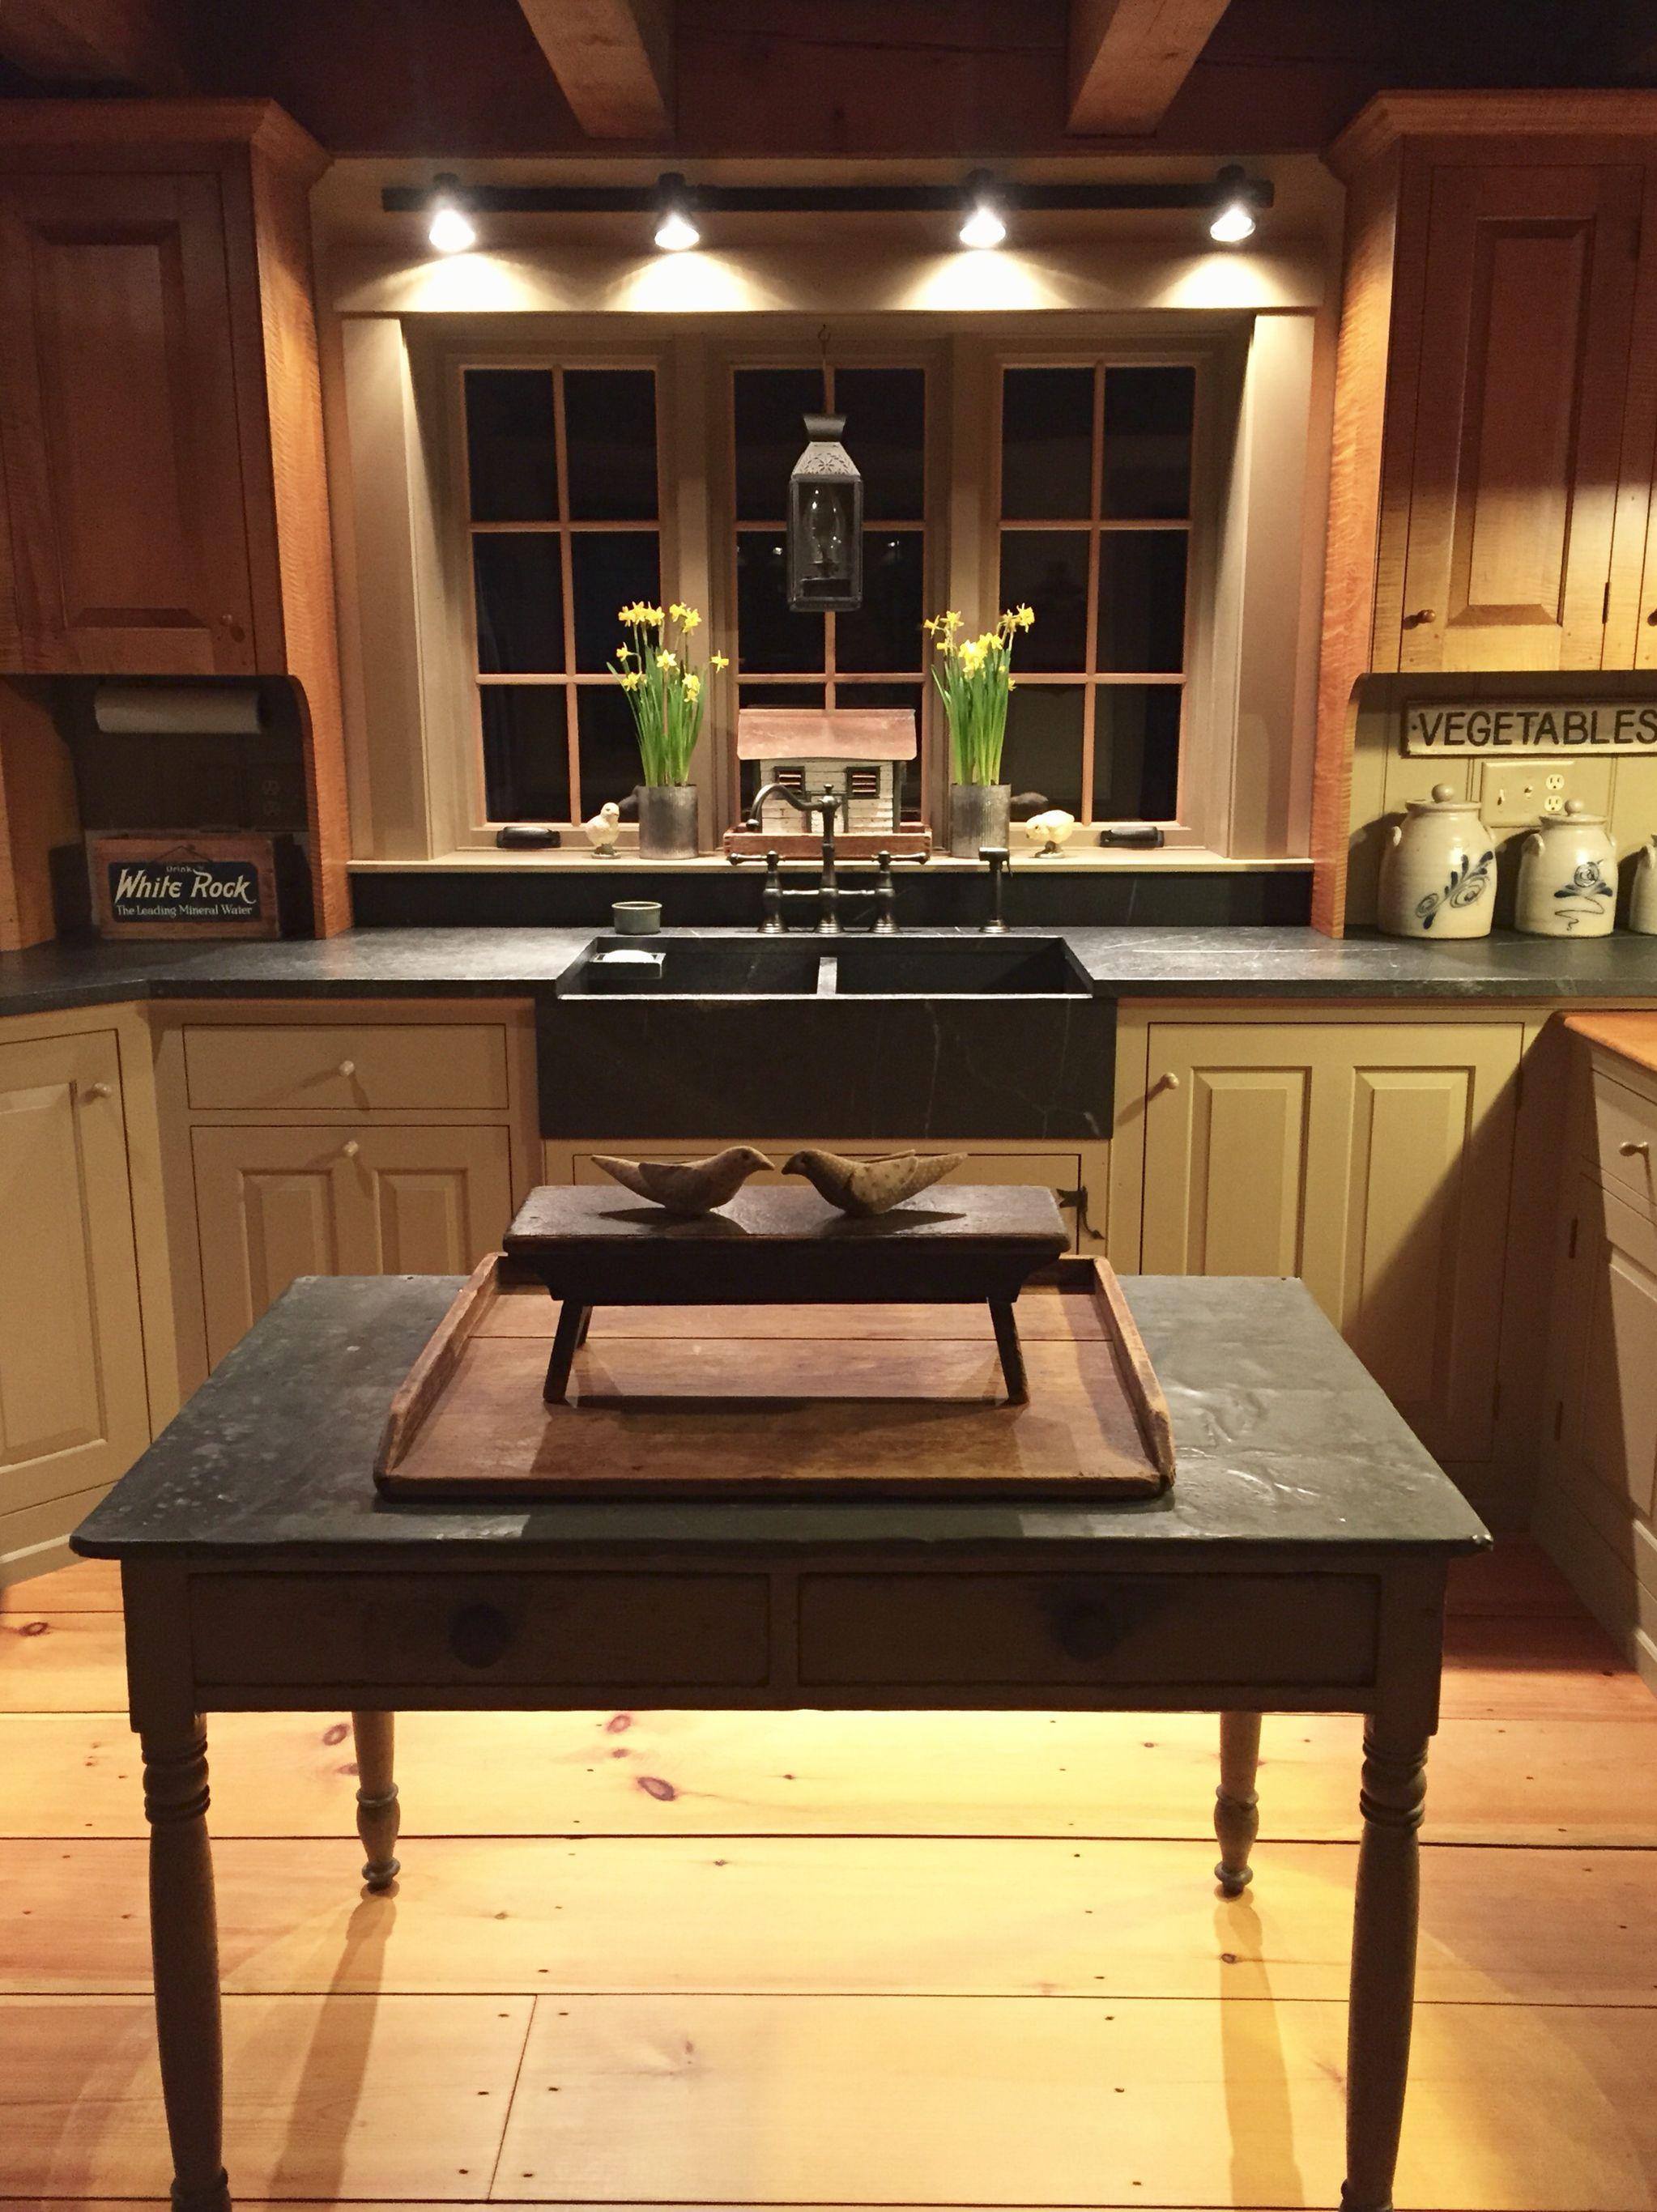 A Kennebec Kitchen This Kitchen Is Amazing Country Kitchen Country Kitchen Decor Kitchen Decor